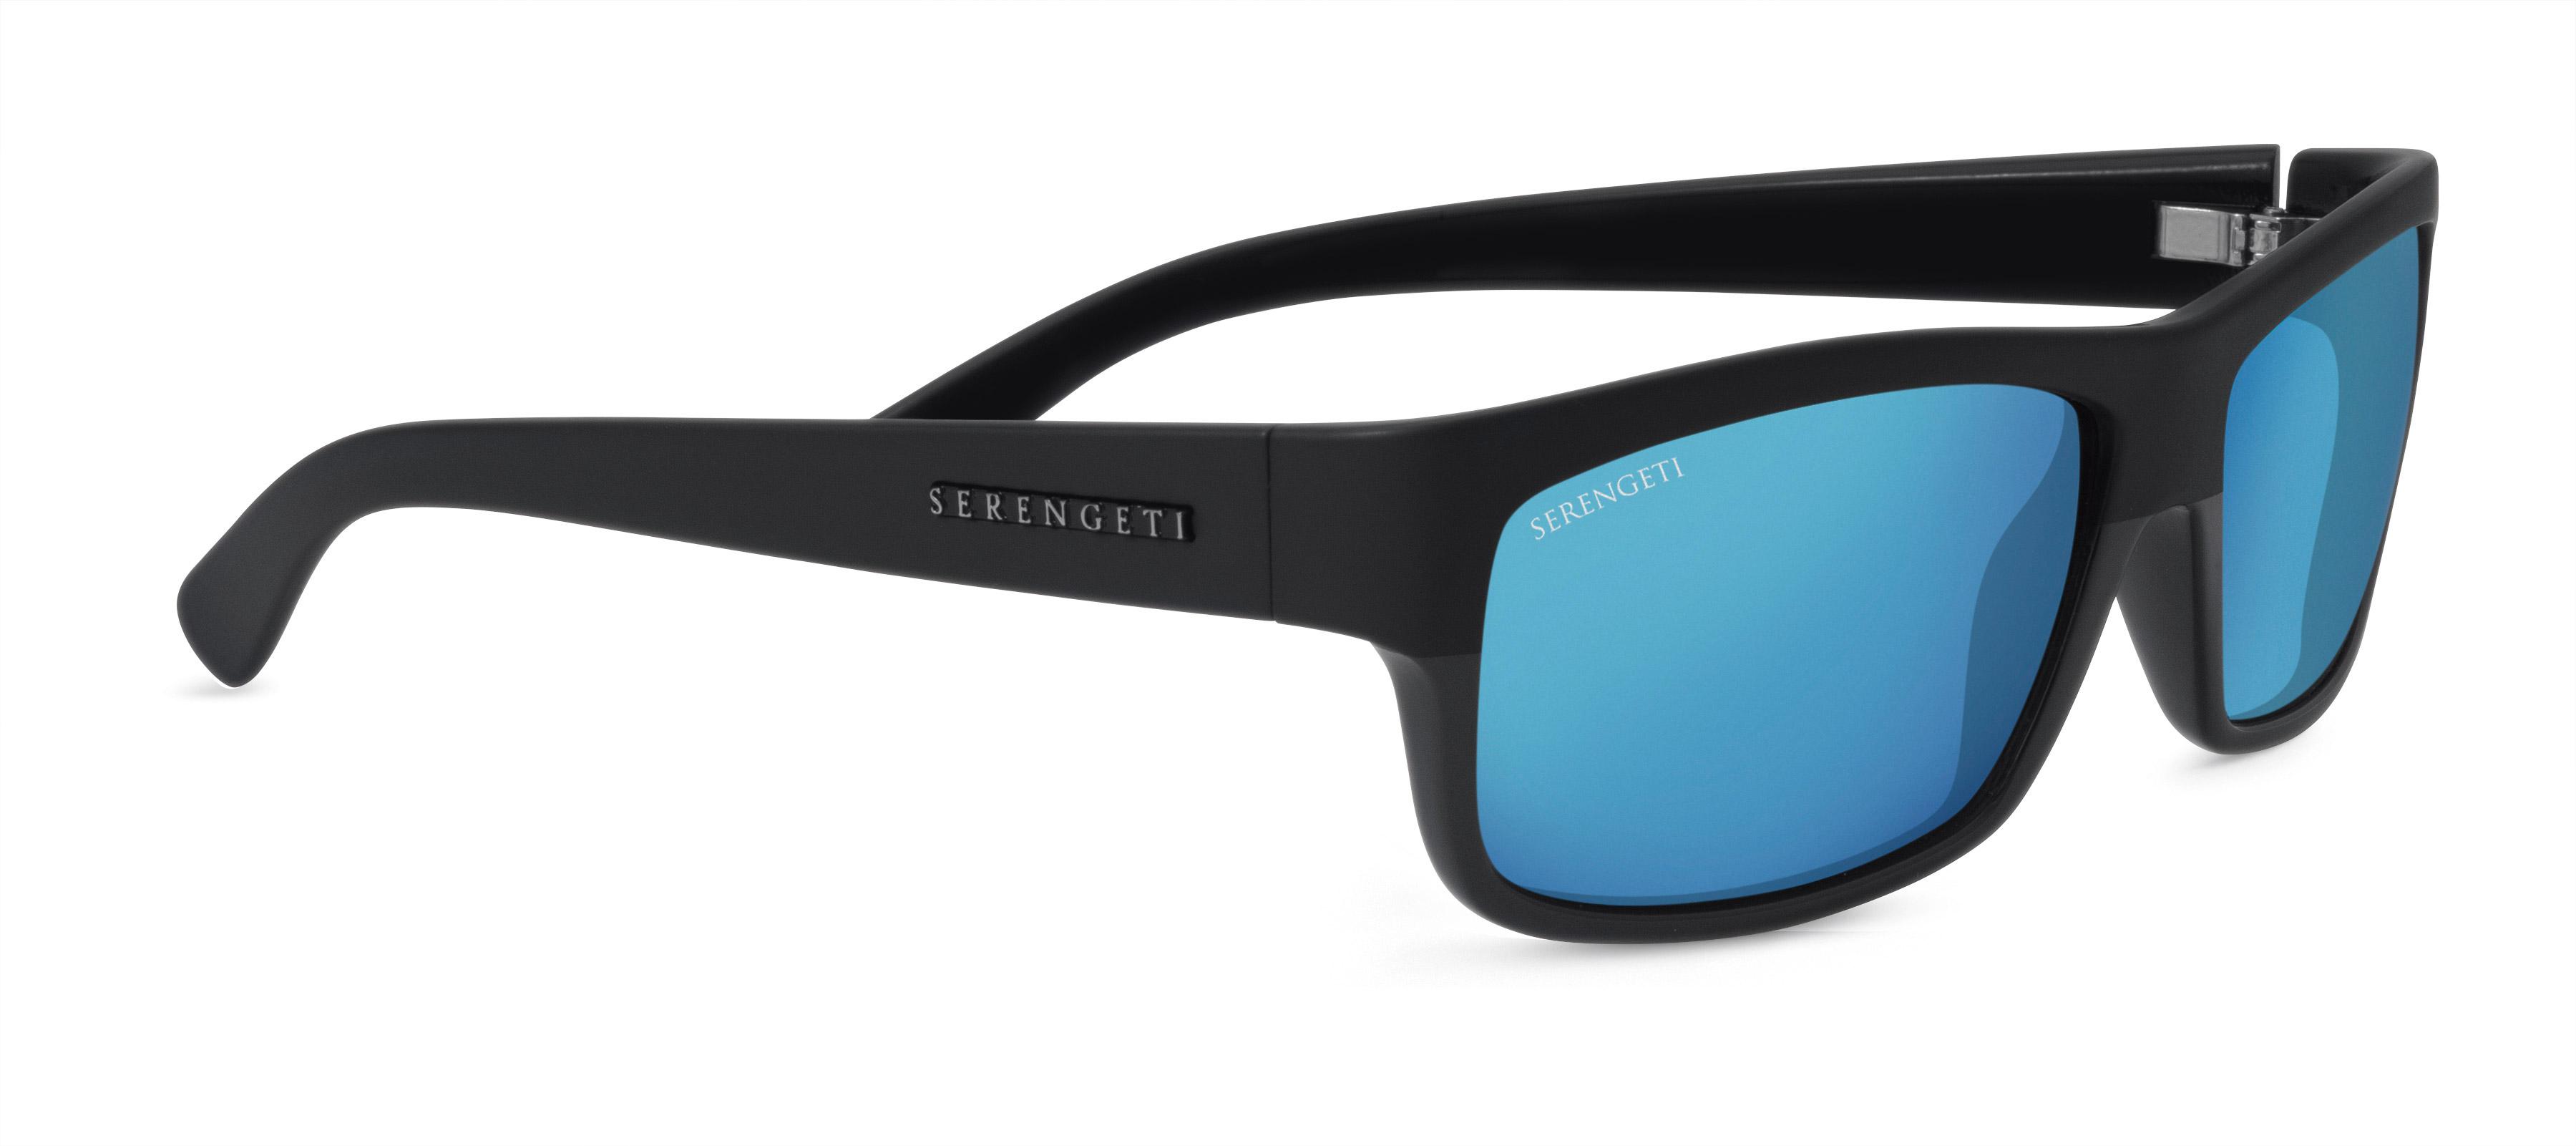 080762057c6ce Serengeti Classics Progressive Martino Sunglasses